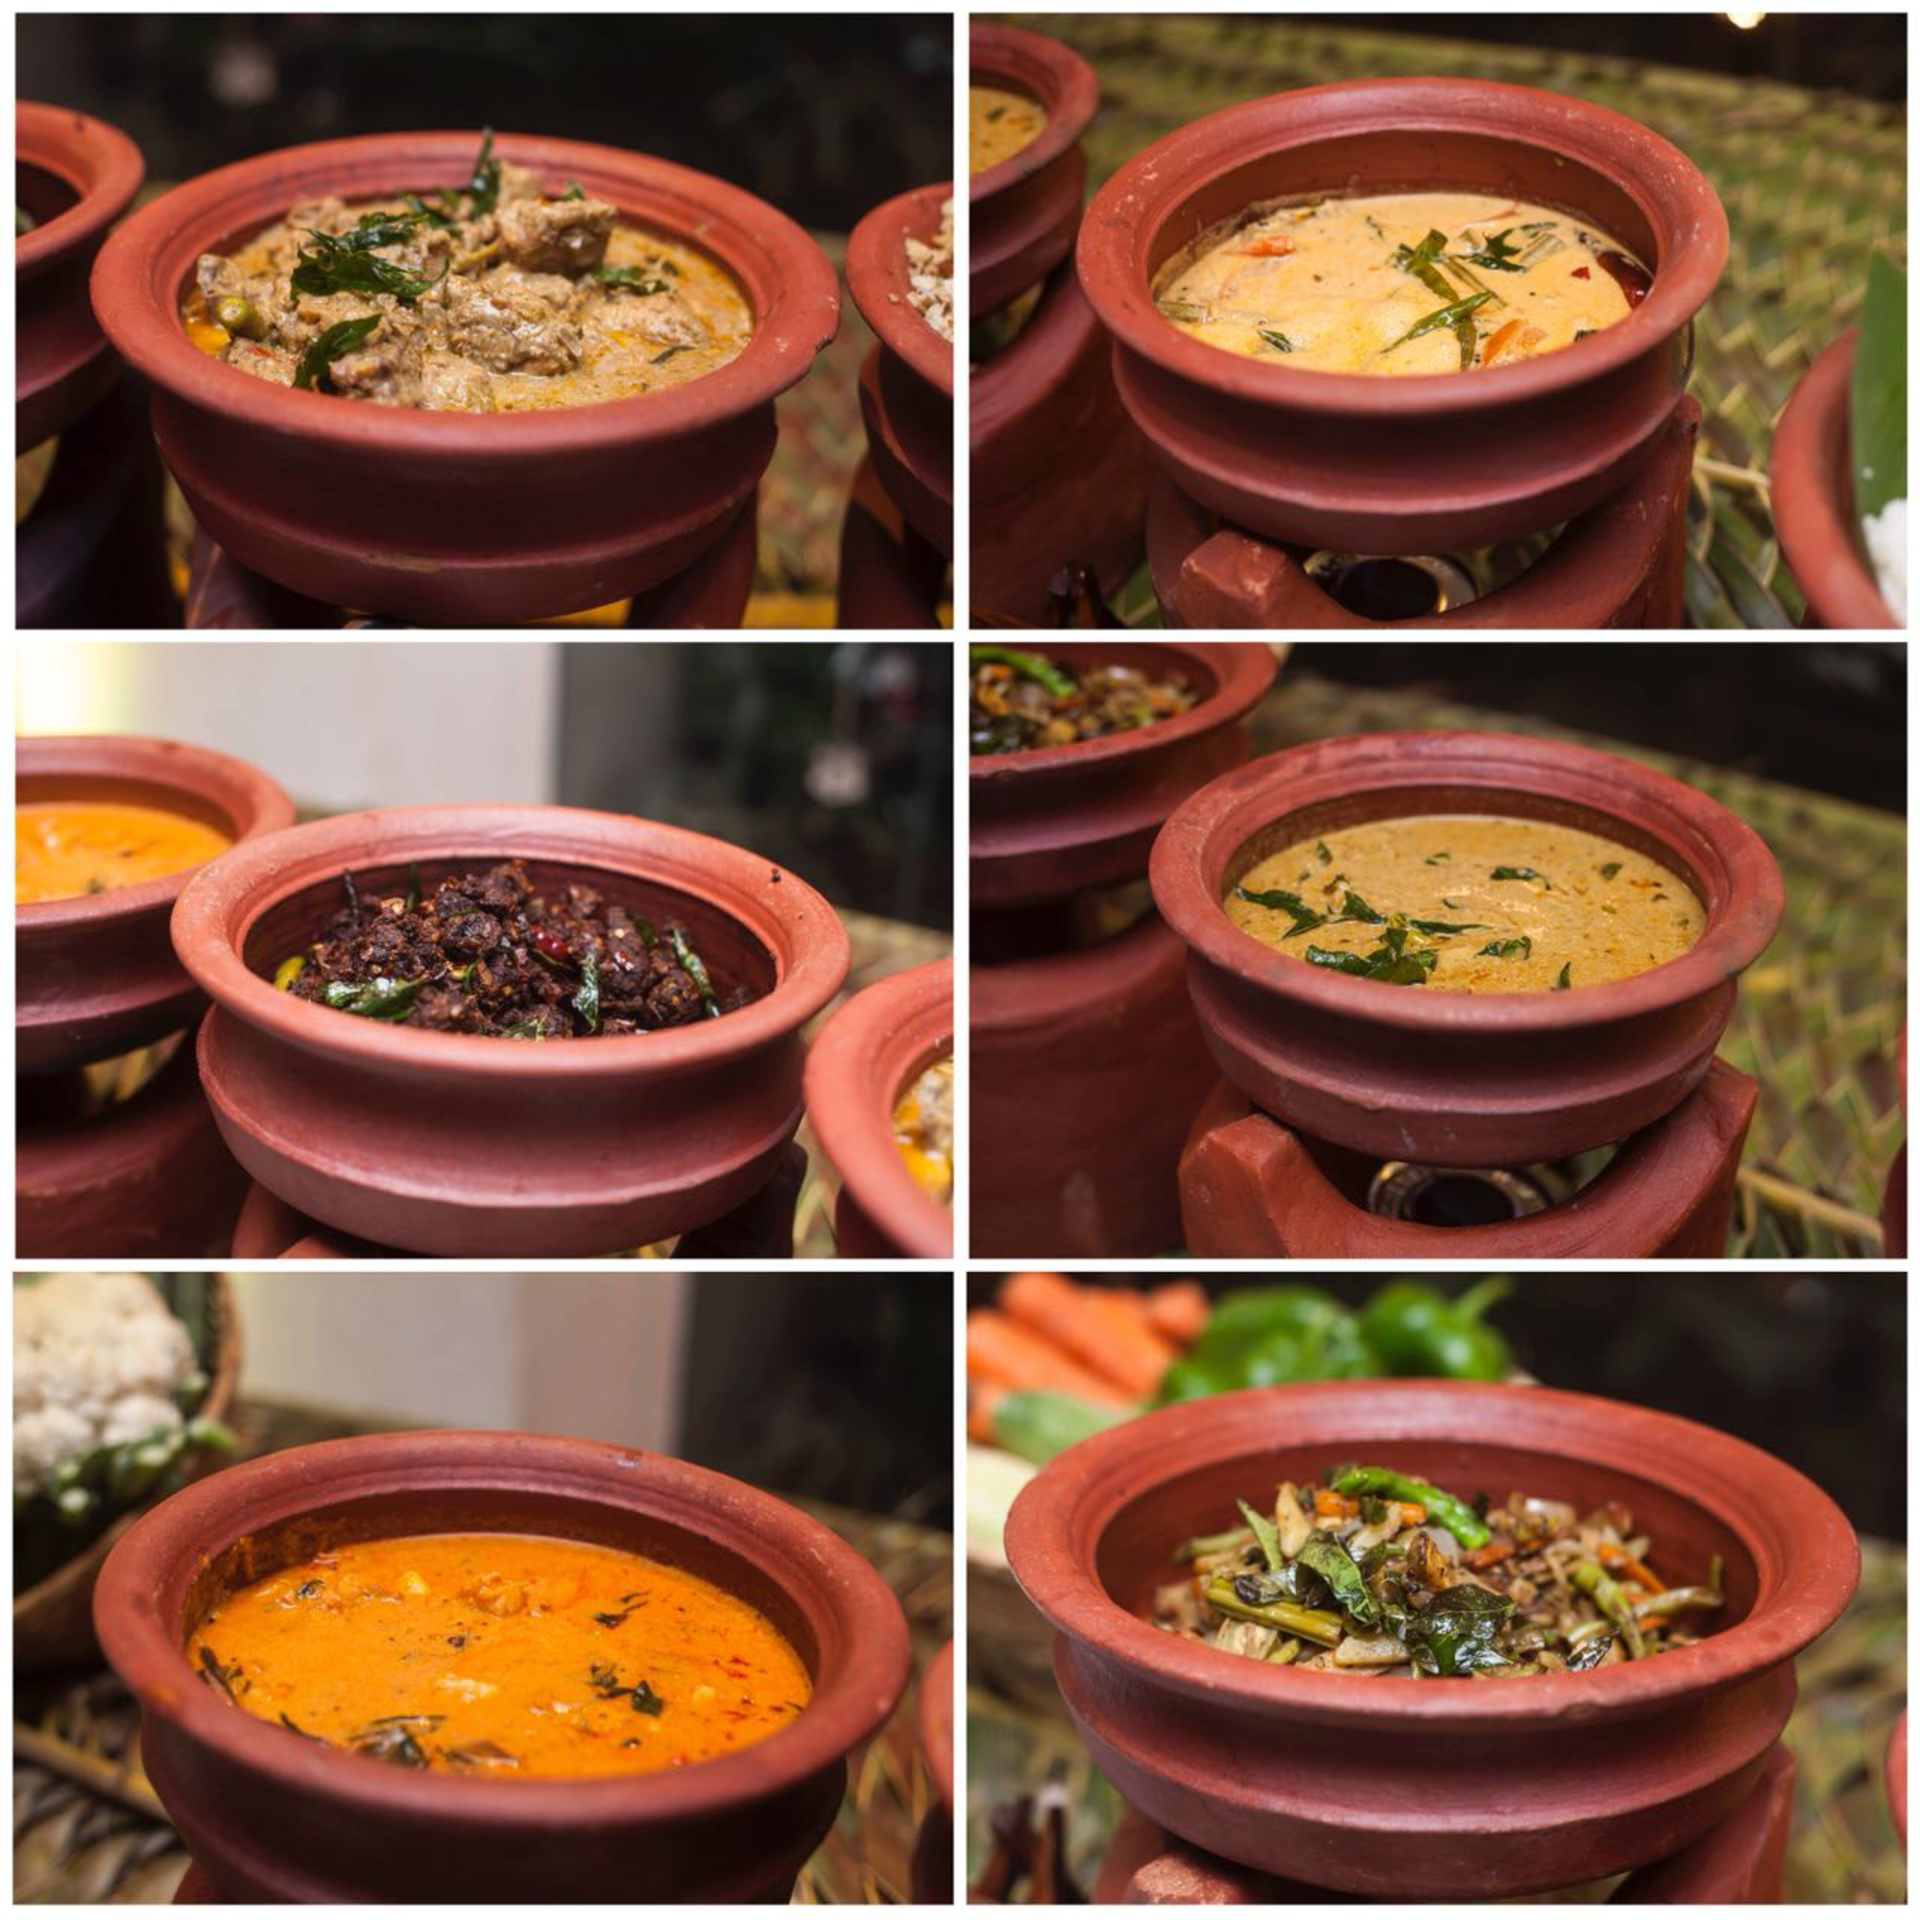 Purnis Food Blog - WhatsApp Image 2018-05-16 at 8